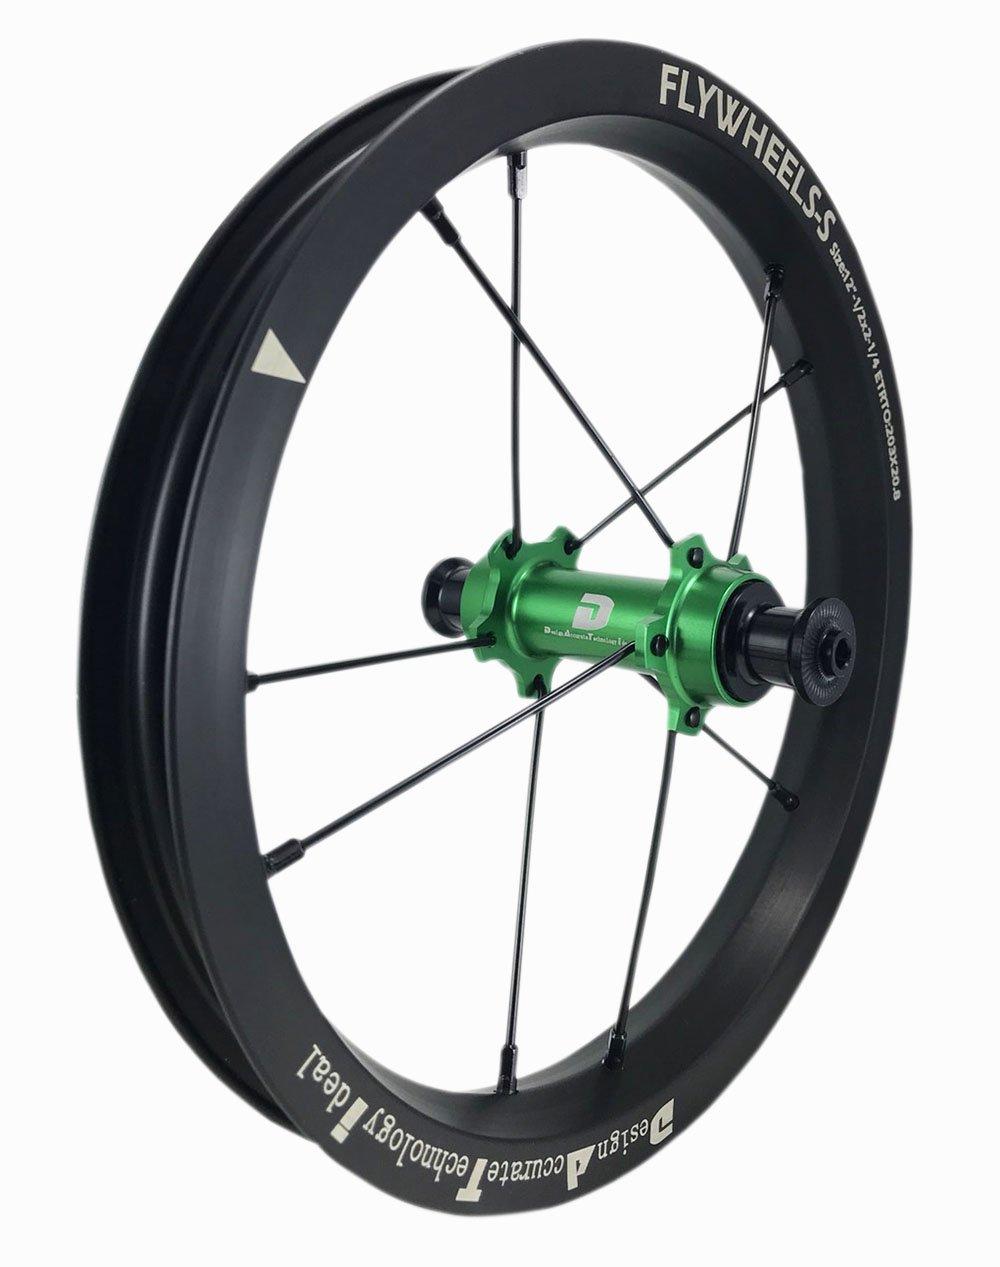 DATI 12インチ S7X-W Alloy レース レベル. 低抵抗.スムーズ.バランスバイク Kids Balance Bike Bicycle Super light 子供自転車ホイール B07DKCP73K Strider :95*8MM|緑 緑 Strider :95*8MM